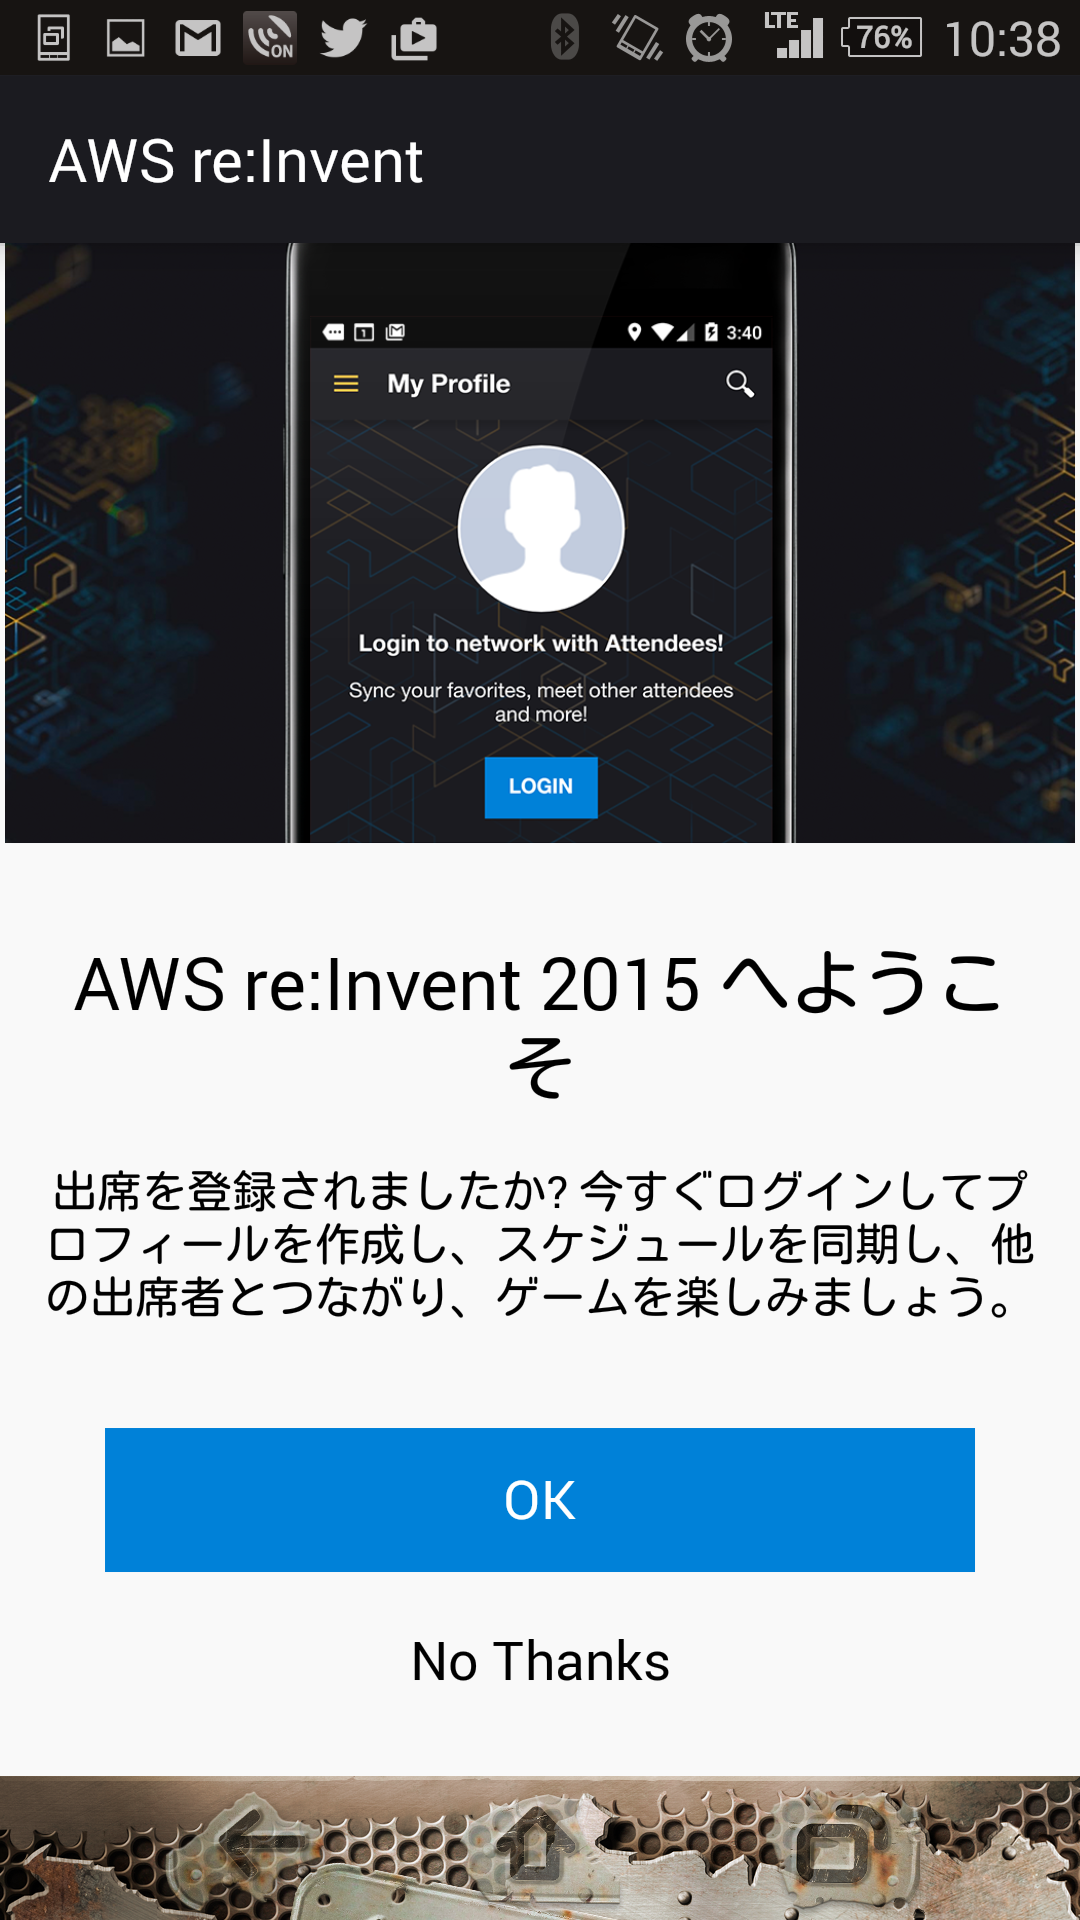 aws-reinvent-2015-event-app_03